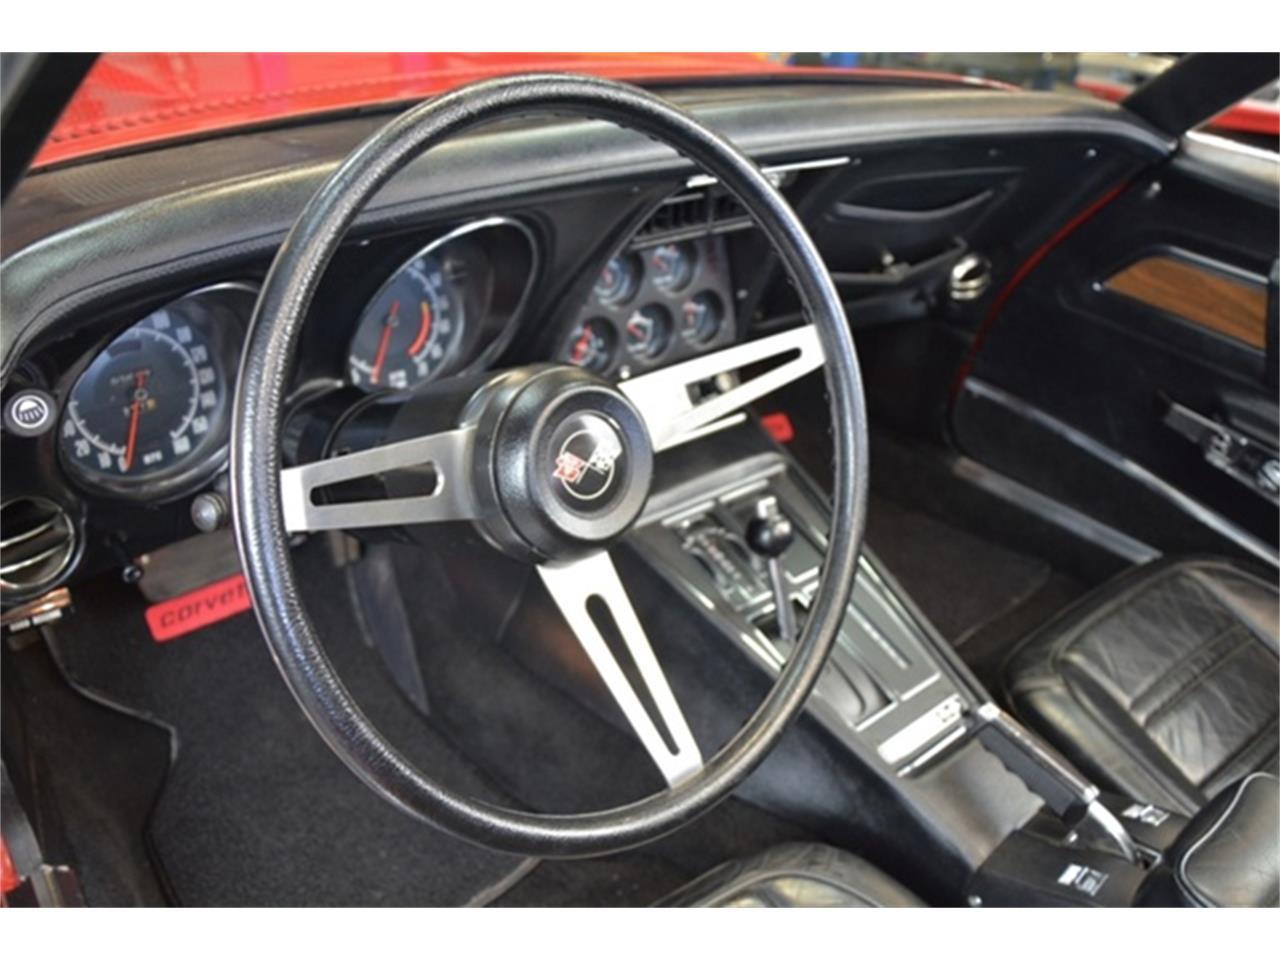 Large Picture of Classic '72 Corvette located in Michigan - $39,995.00 - LAFE